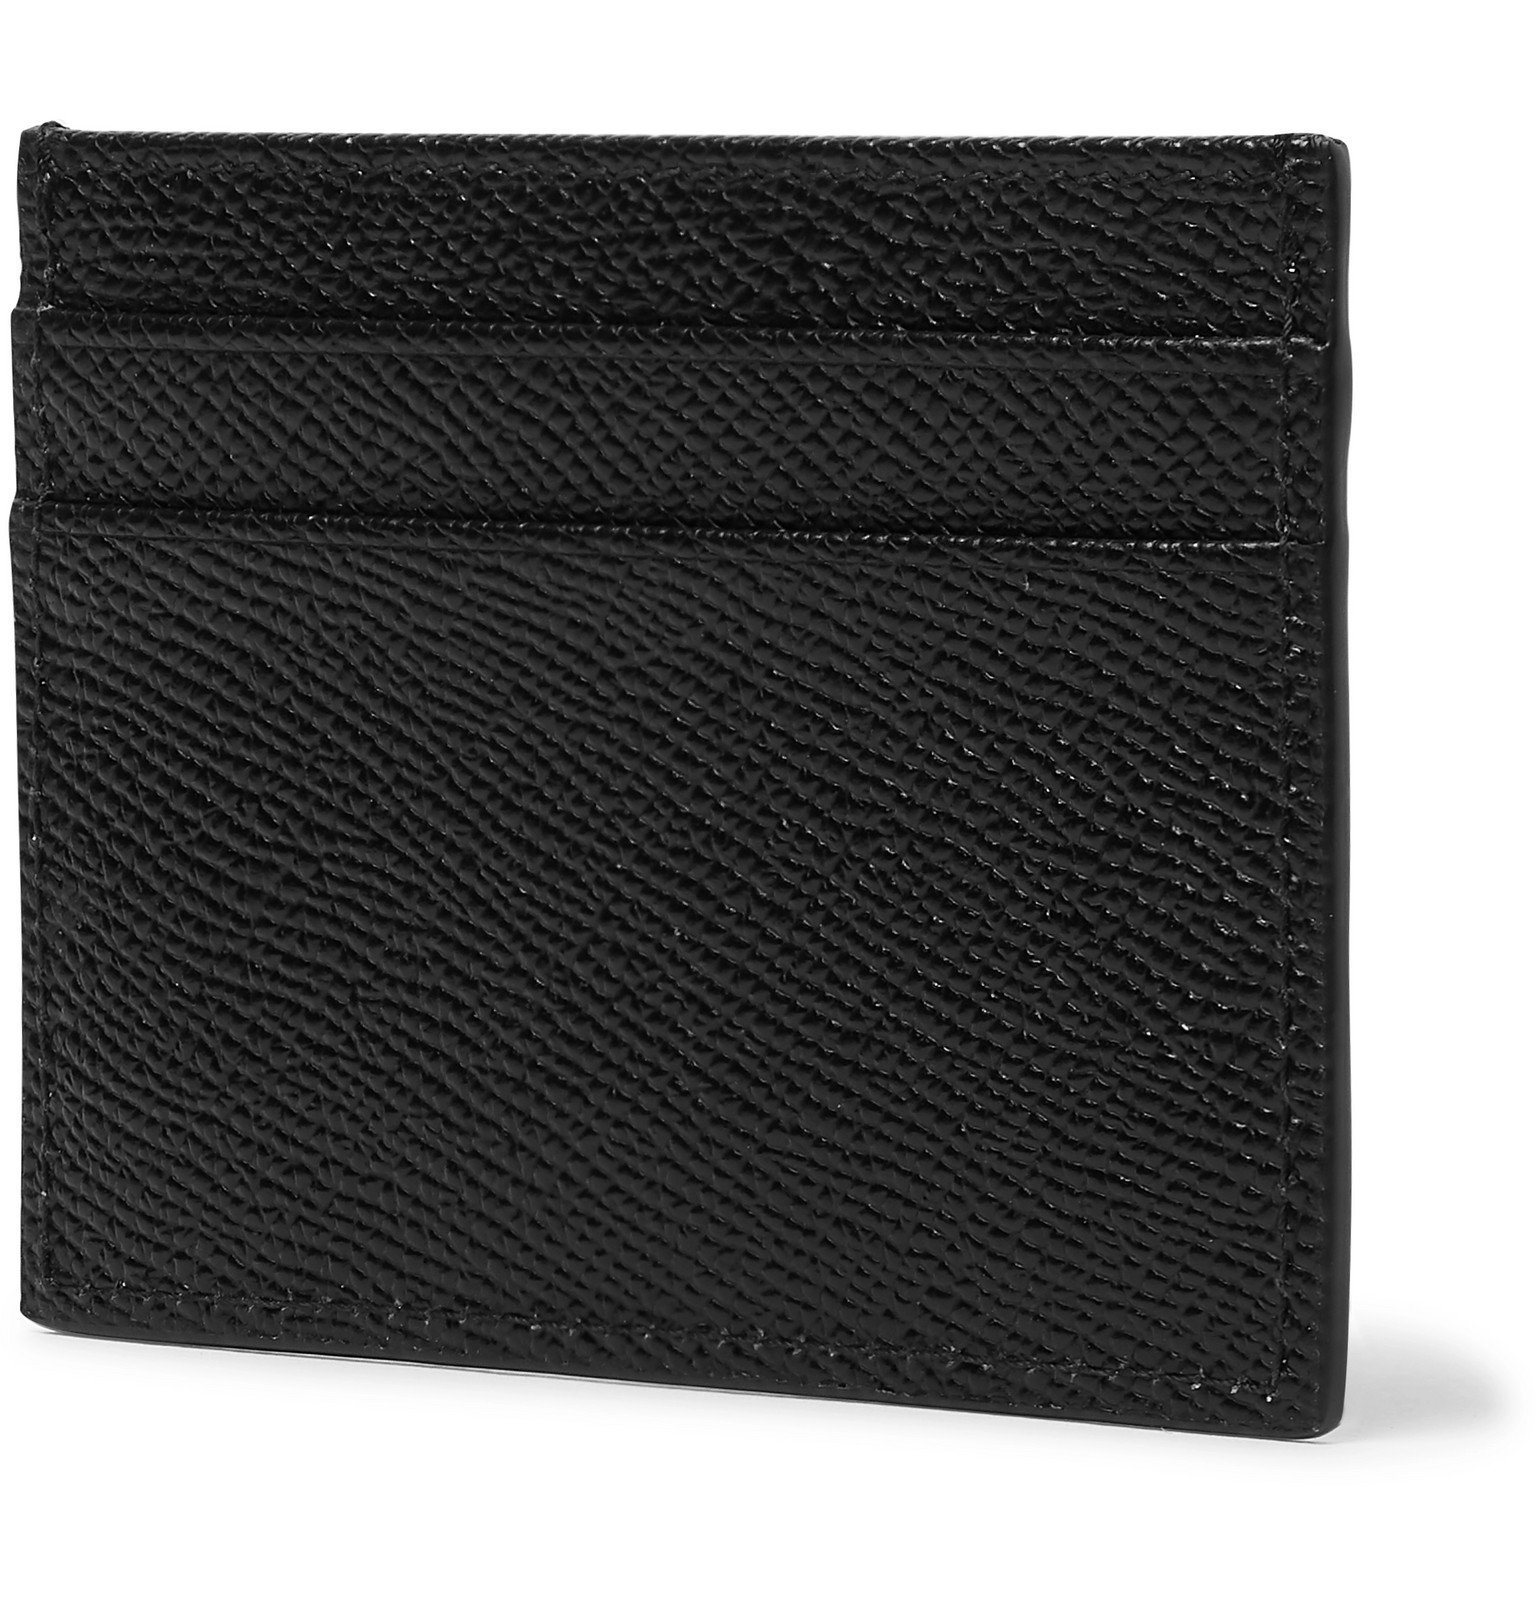 Dolce & Gabbana - Logo-Appliquéd Full-Grain Leather Cardholder - Black